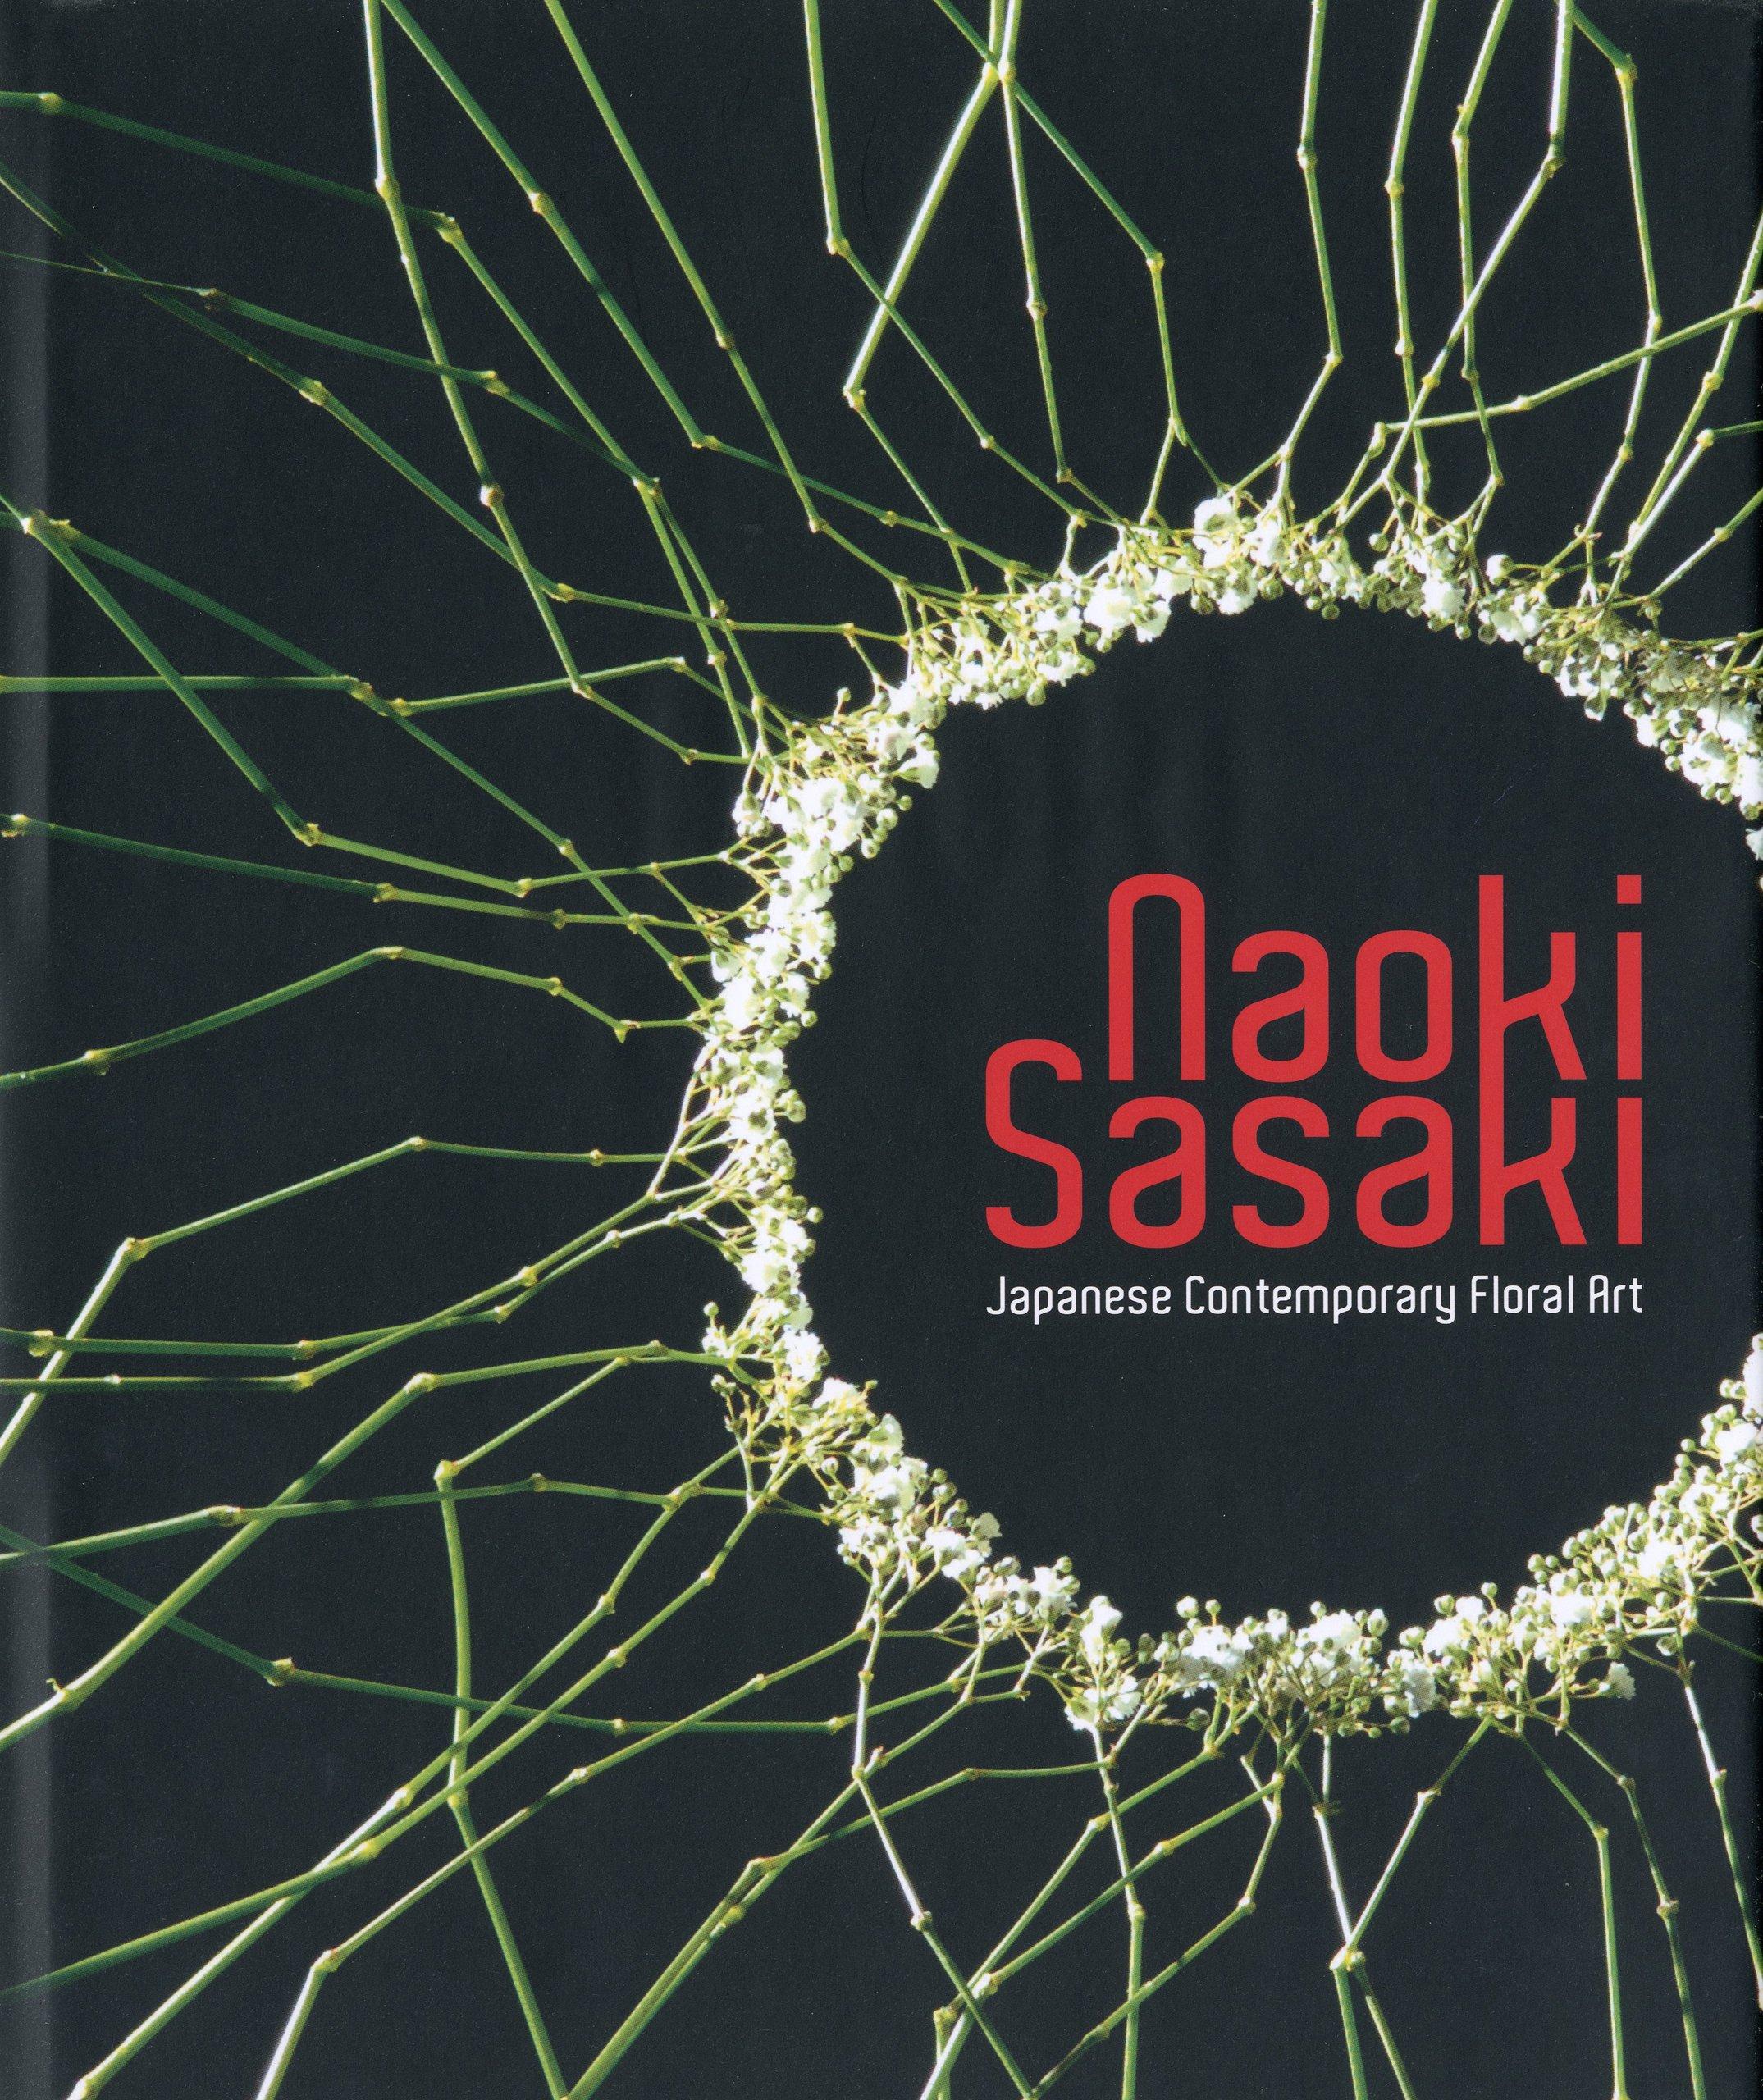 Naoki Sasaki, Japanese Contemporary Floral Art